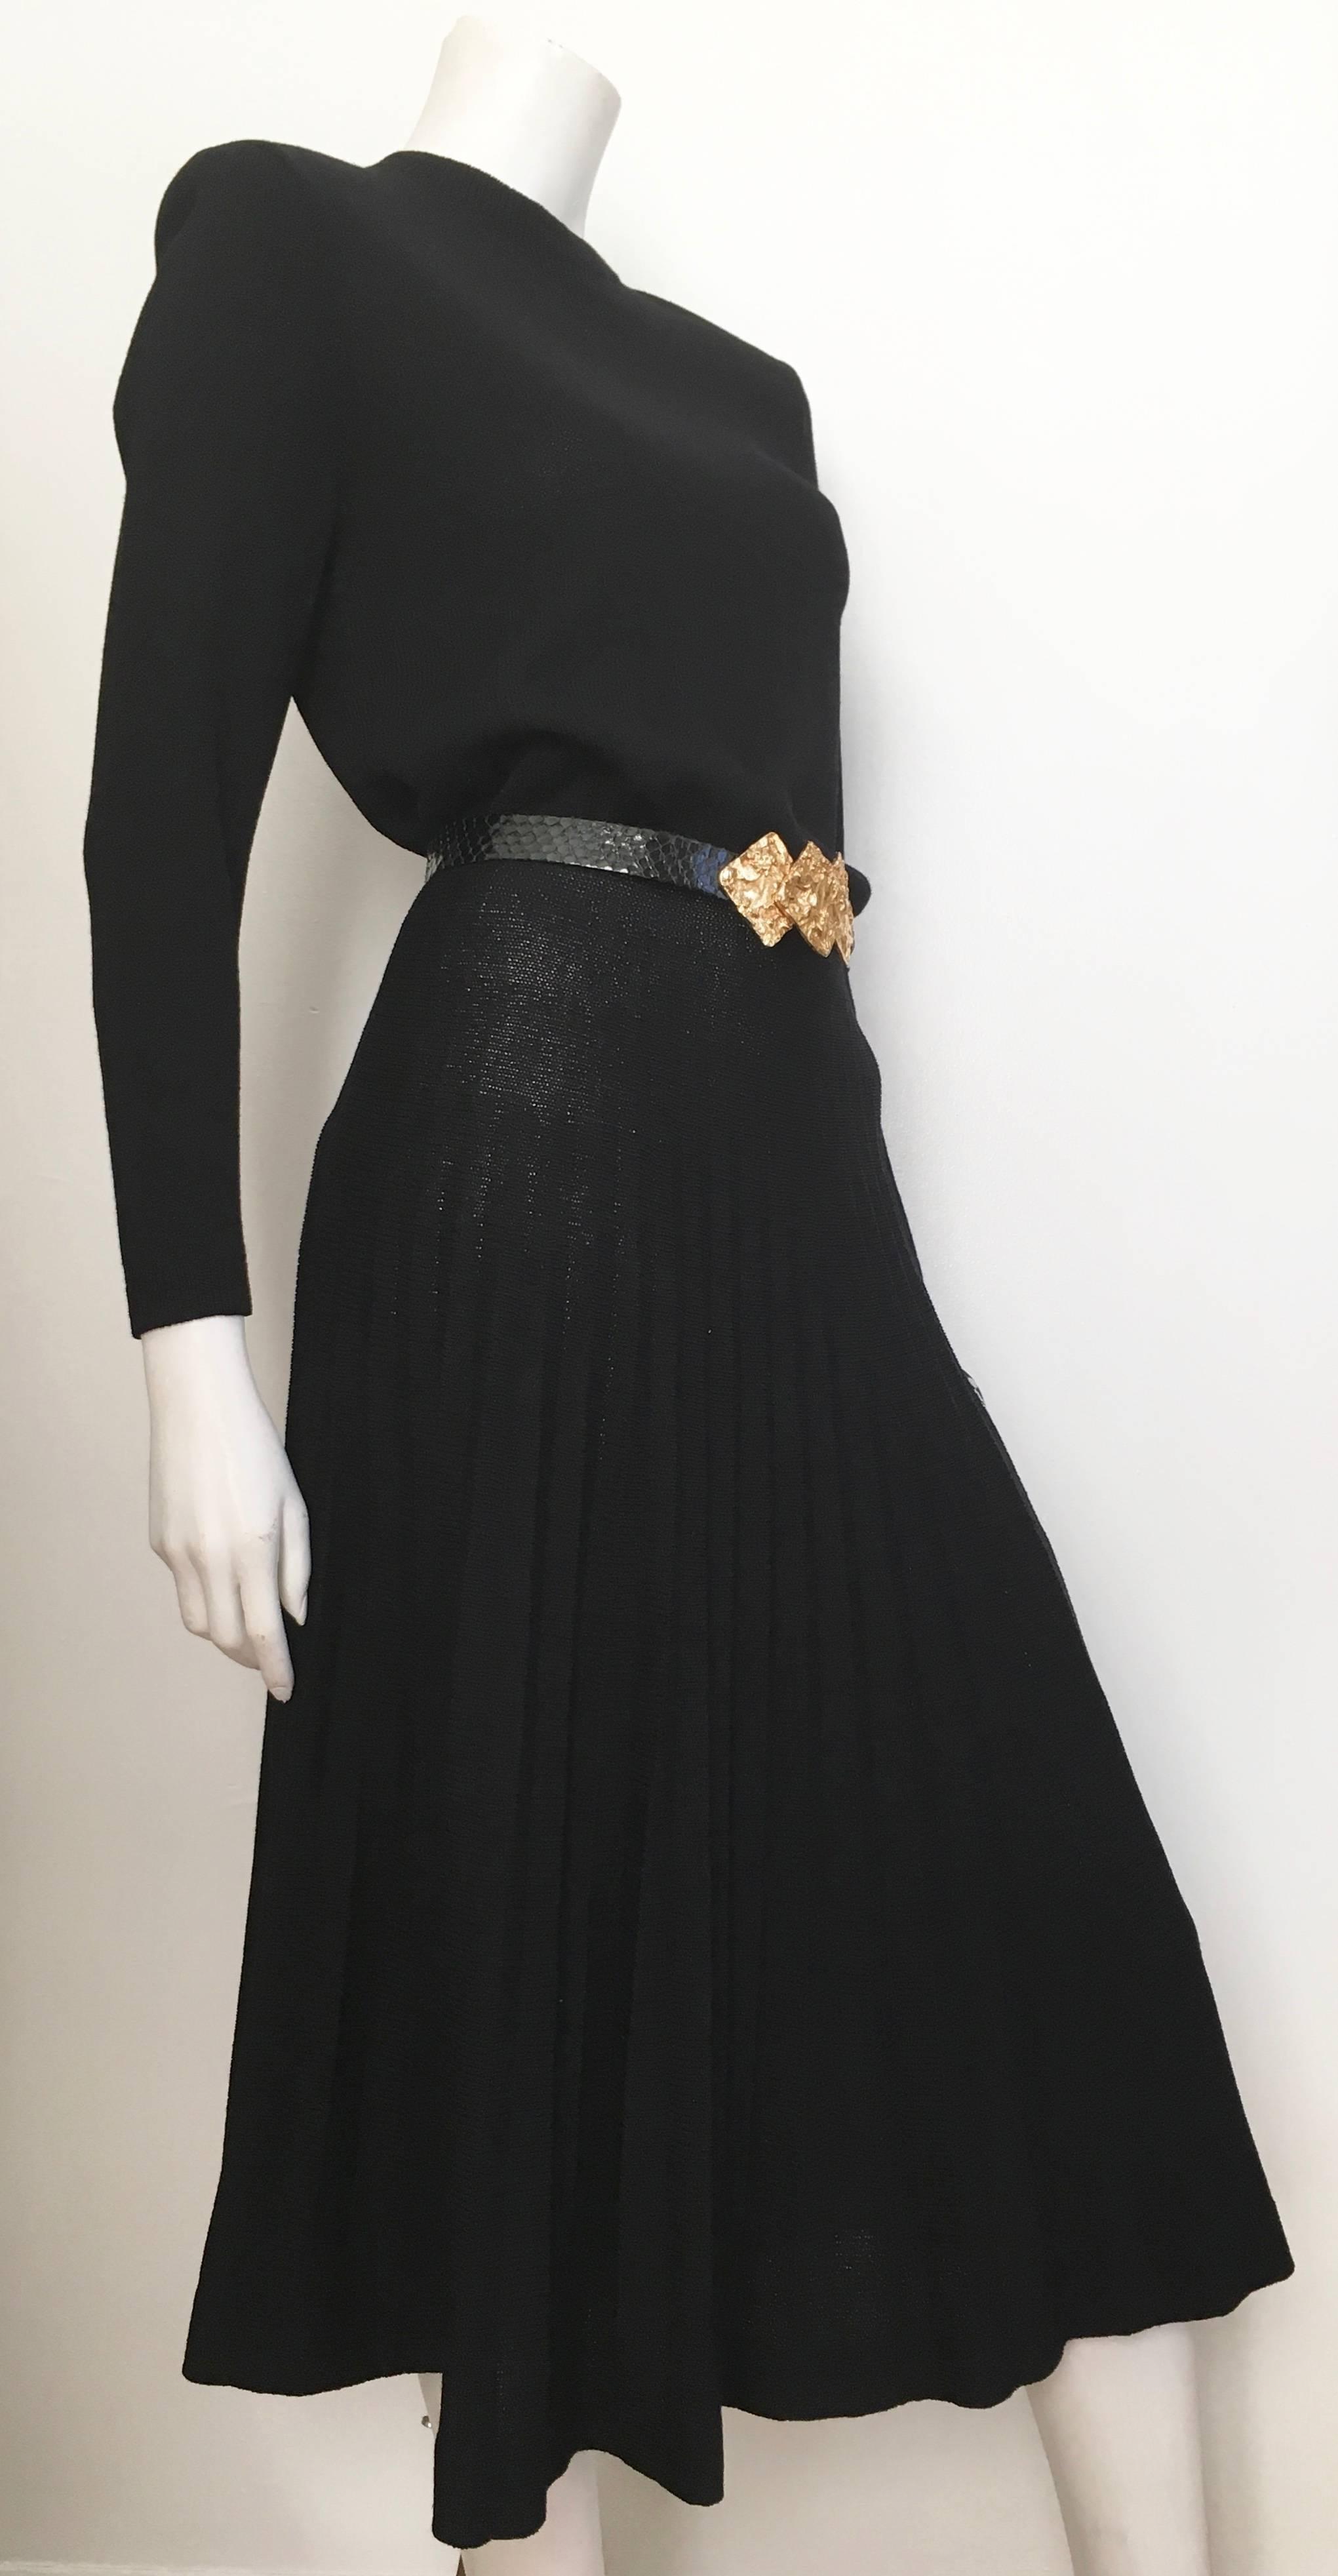 St. John for Neiman Marcus 1980s Black Pleated Knit Dress Size 4 / 6 ...